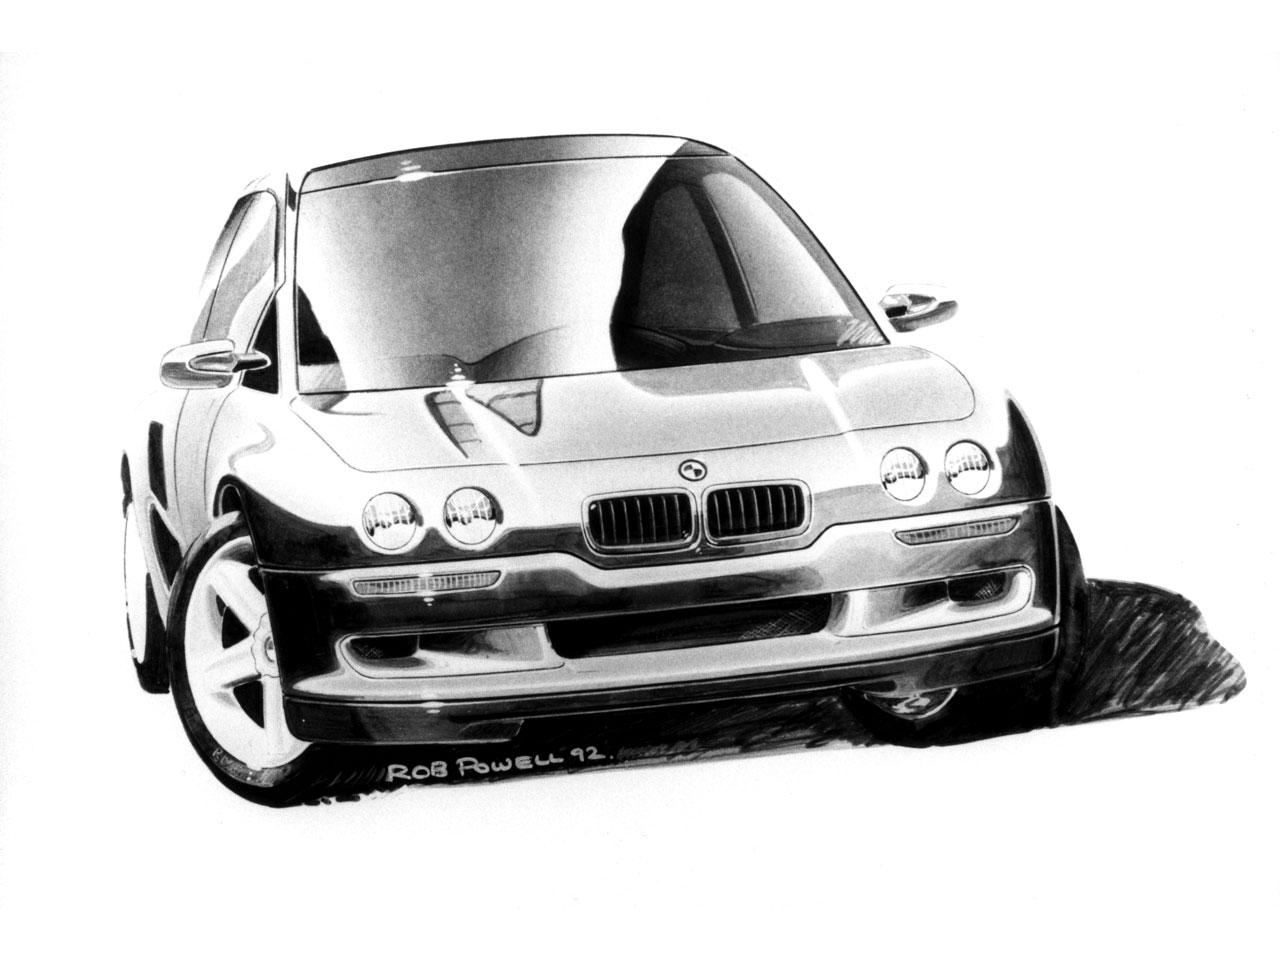 1994 BMW Z13 - Concepts